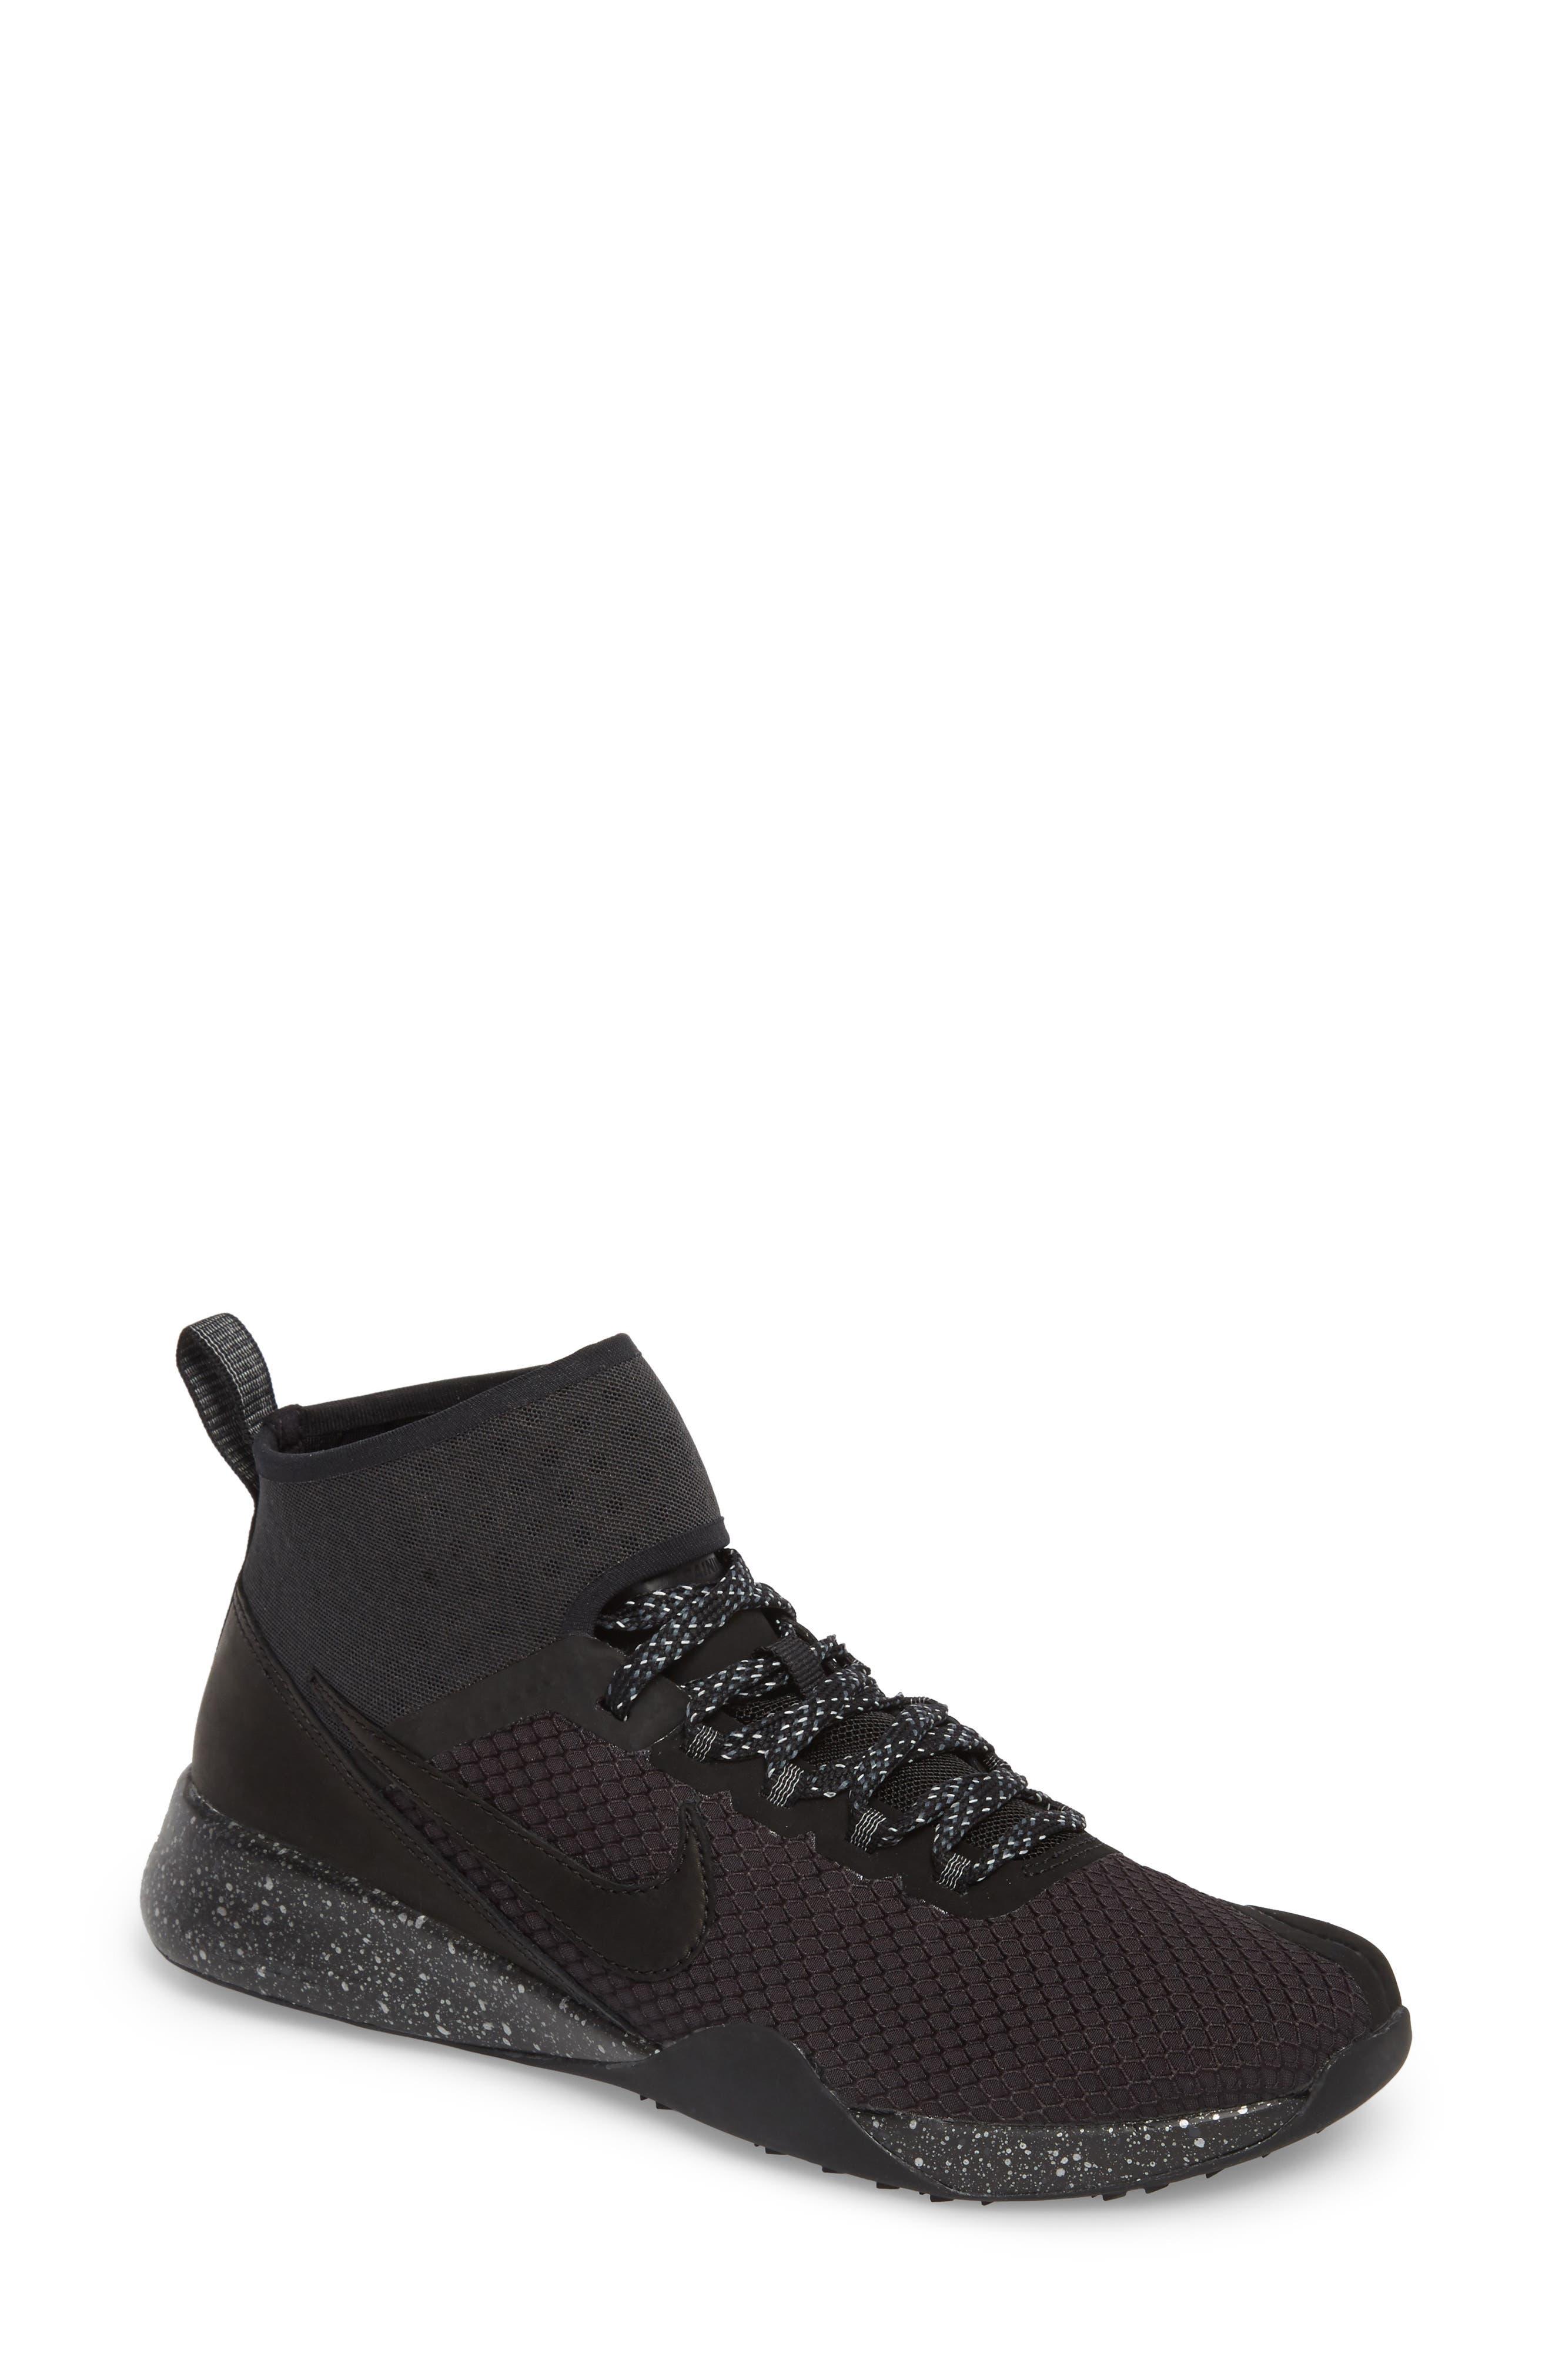 NikeLab Air Zoom Strong 2 Training Shoe,                             Main thumbnail 1, color,                             001